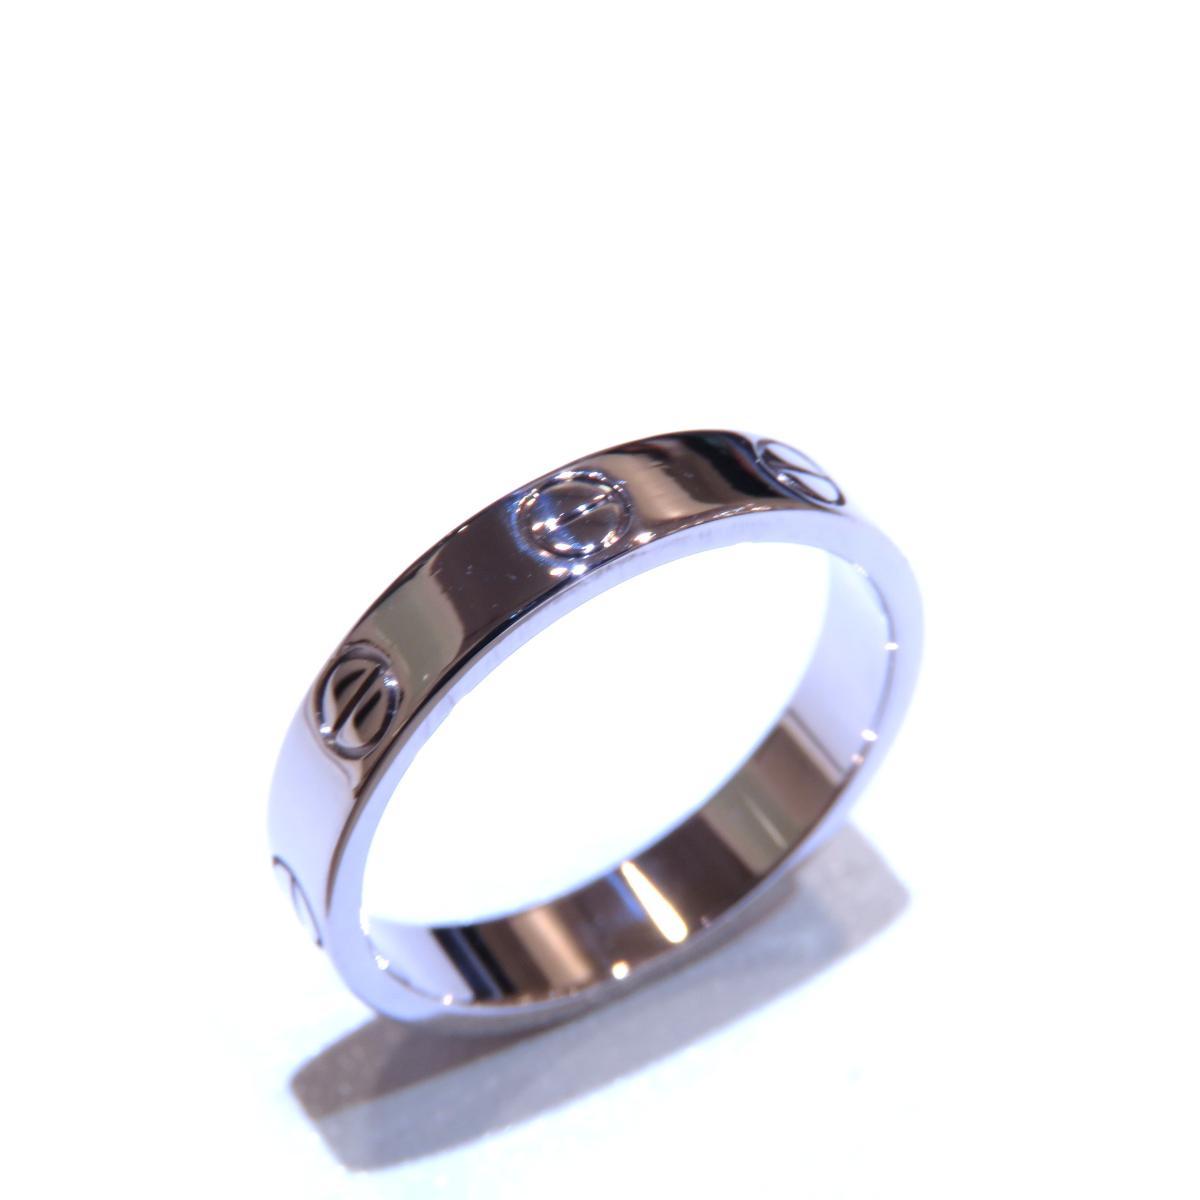 Cartier(カルティエ)/ミニラブリング 指輪/リング//K18WG(750)ホワイトゴールド/【ランクA】/#52/12号【中古】